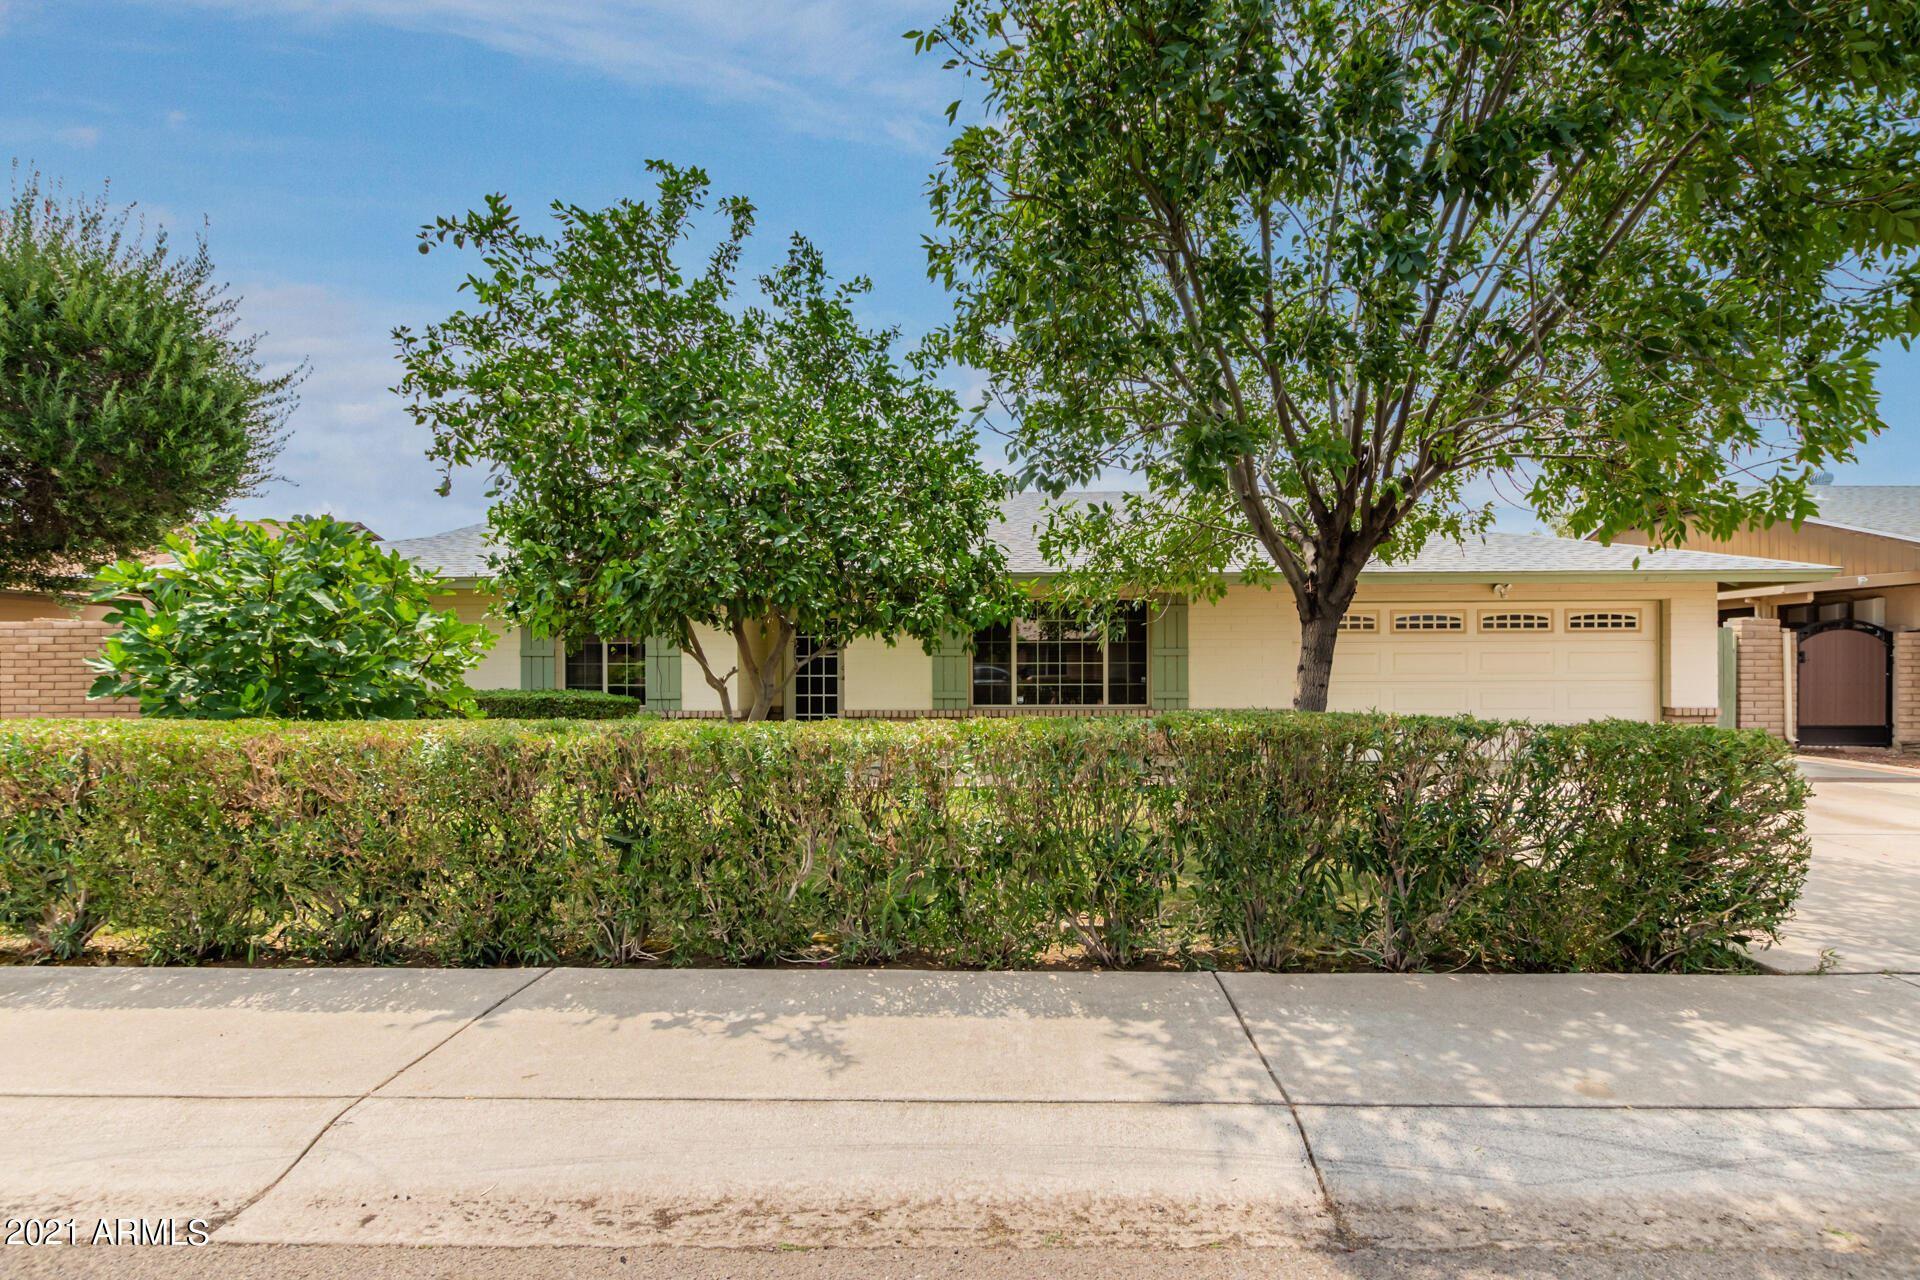 519 E ANGELA Drive, Phoenix, AZ 85022 - MLS#: 6284746